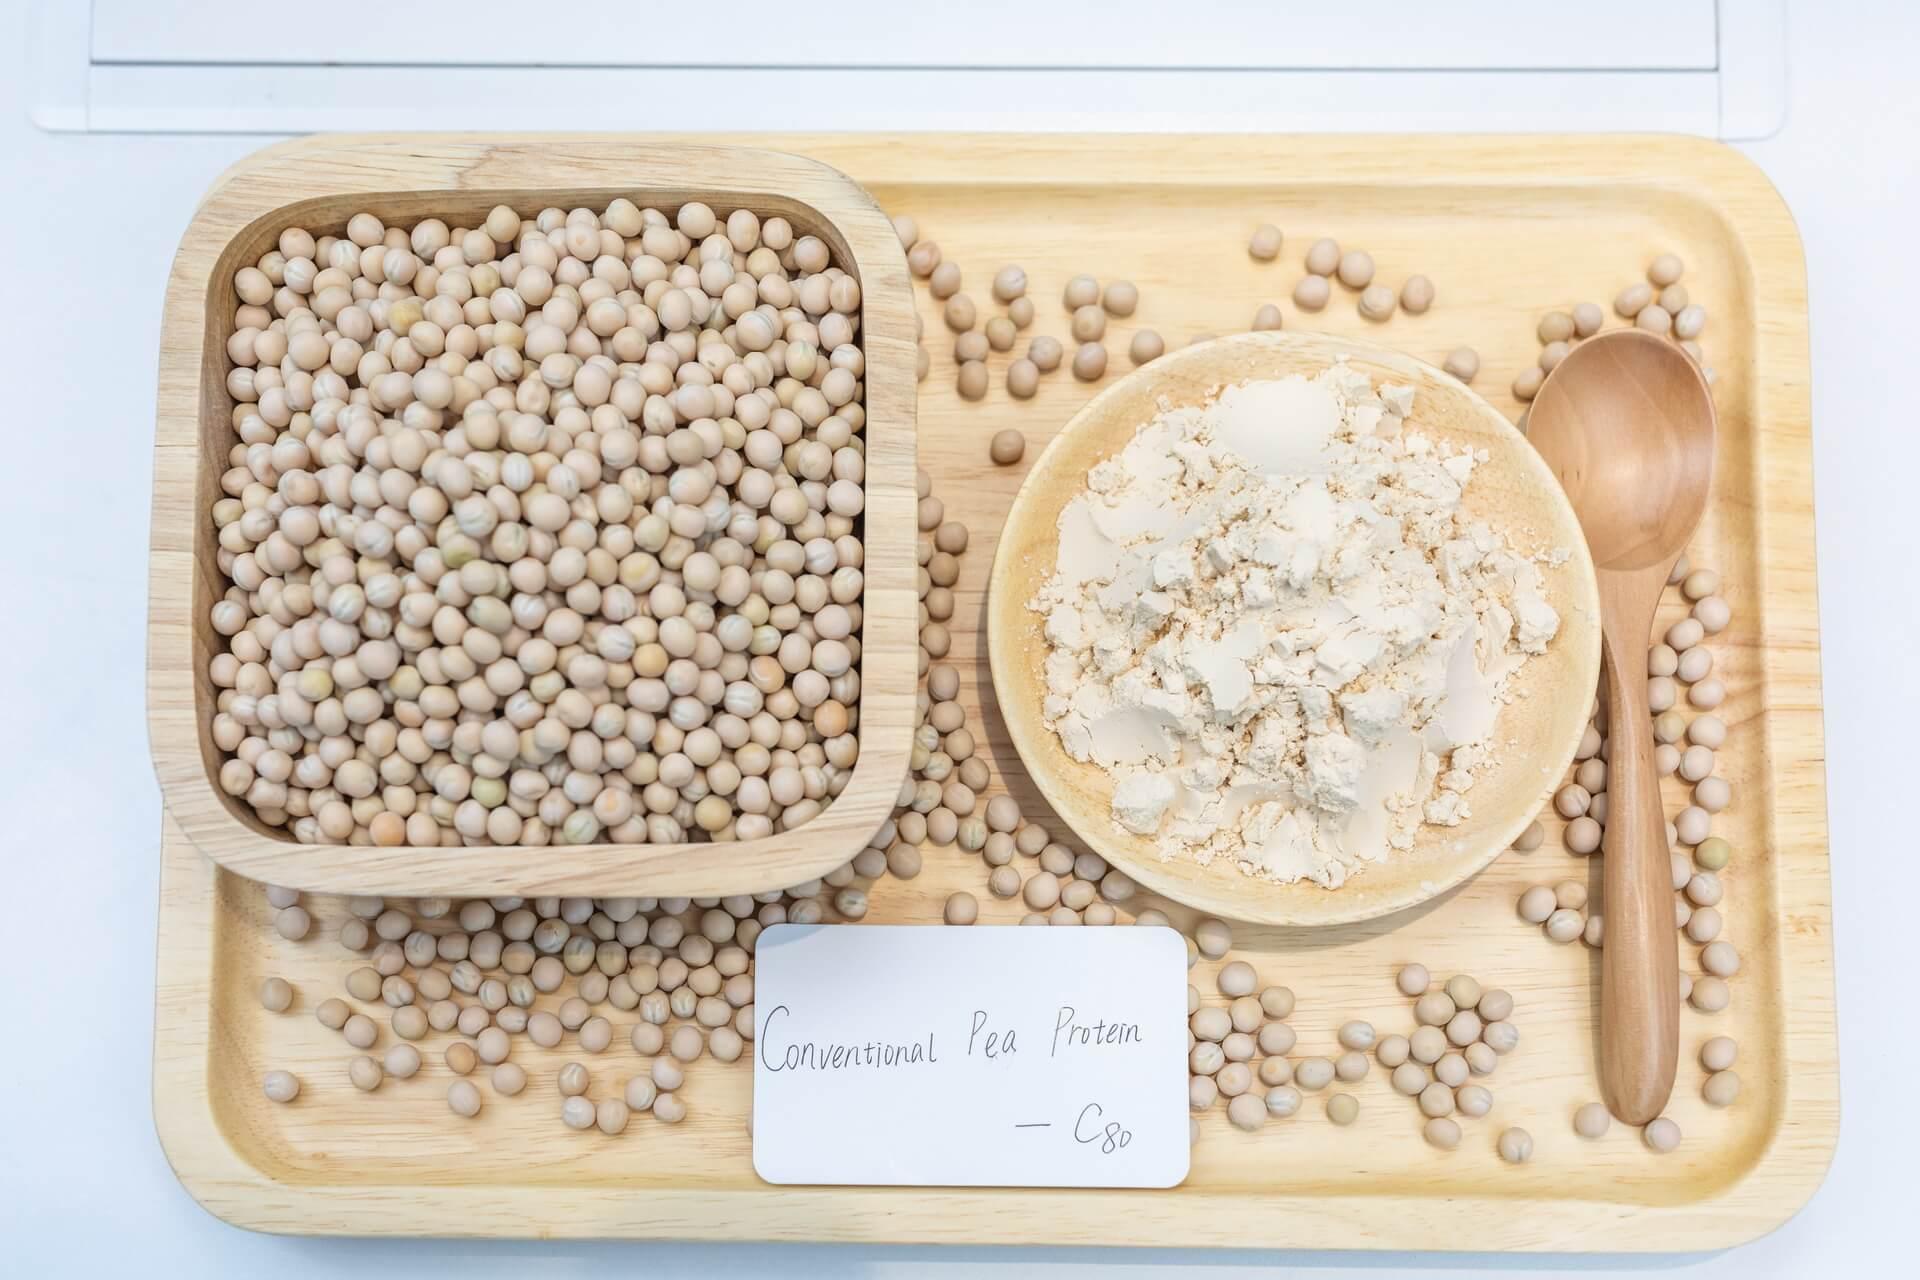 Hua Thai protein TDS - Pea Protein Isolate Powder C80A